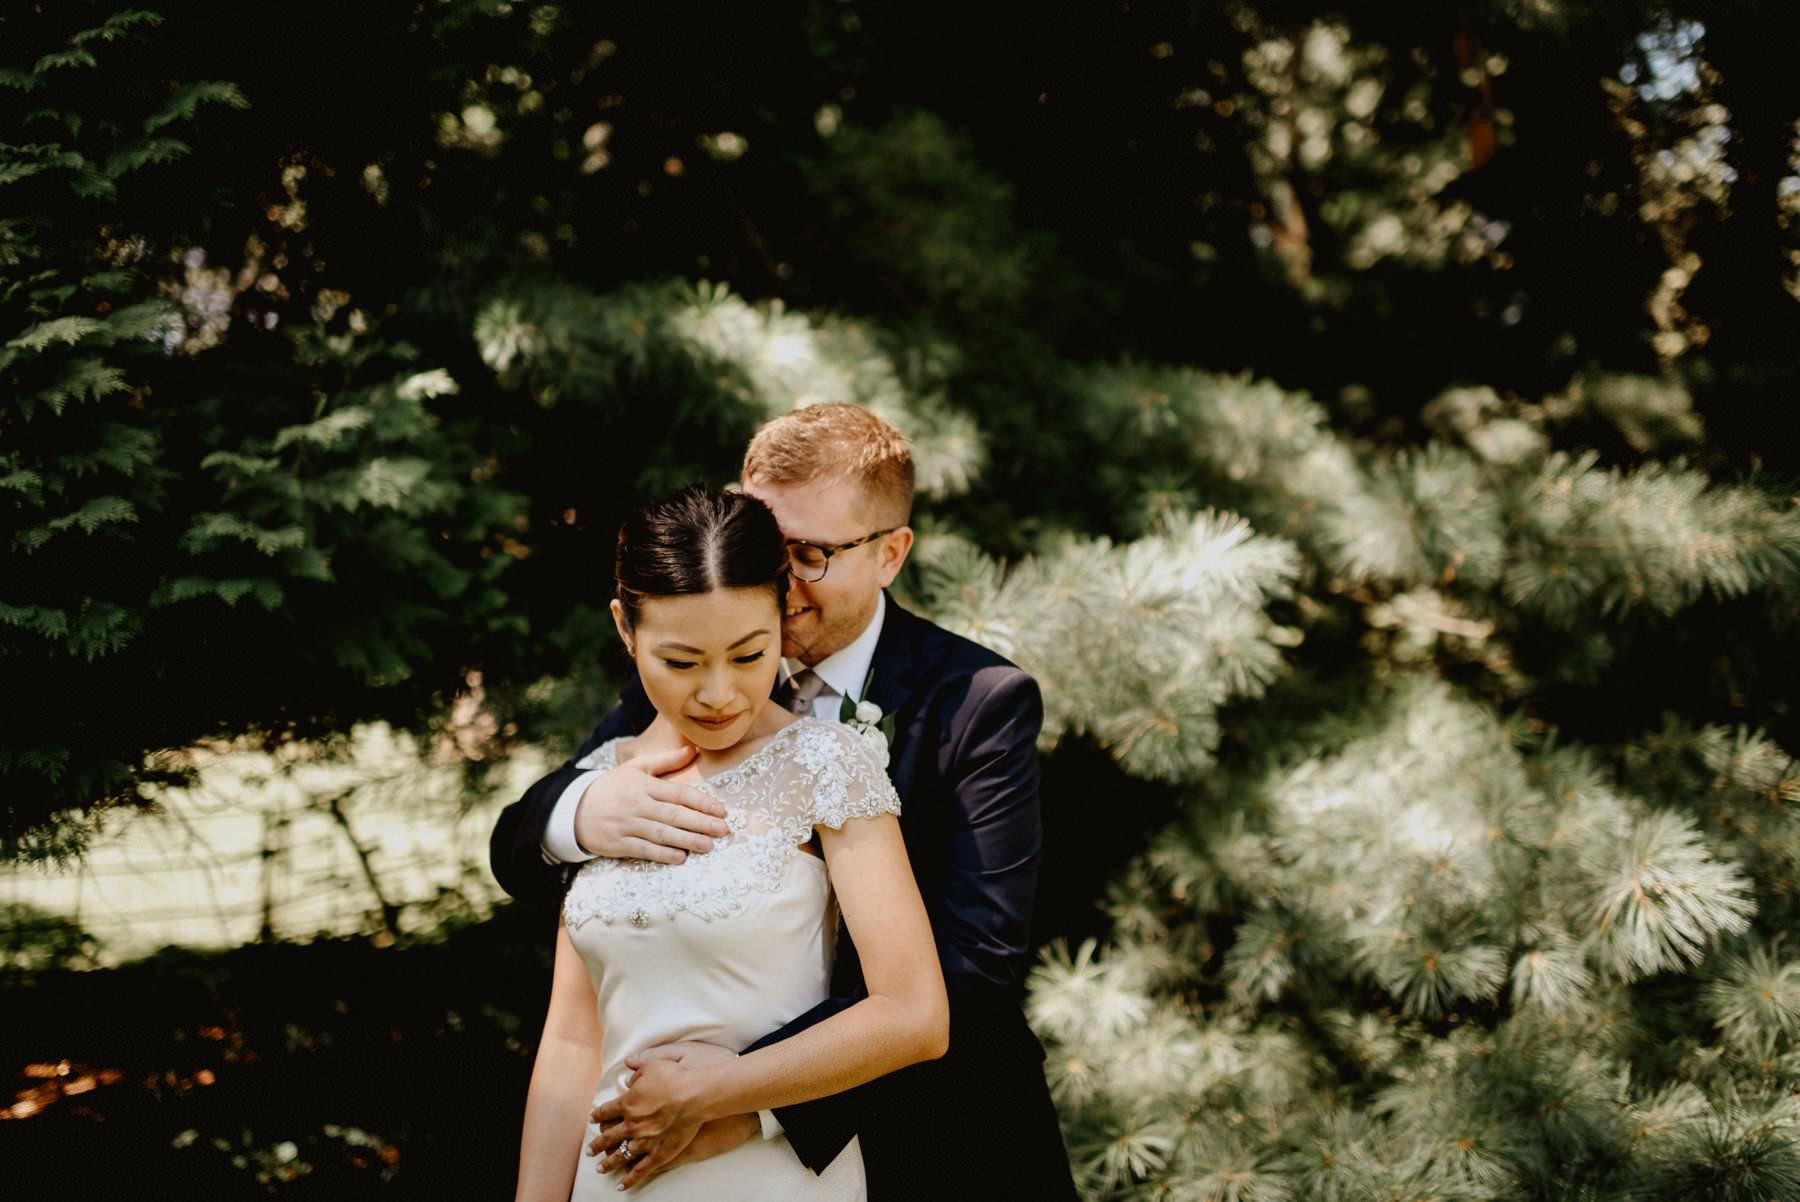 Appleford-estate-wedding-66.jpg